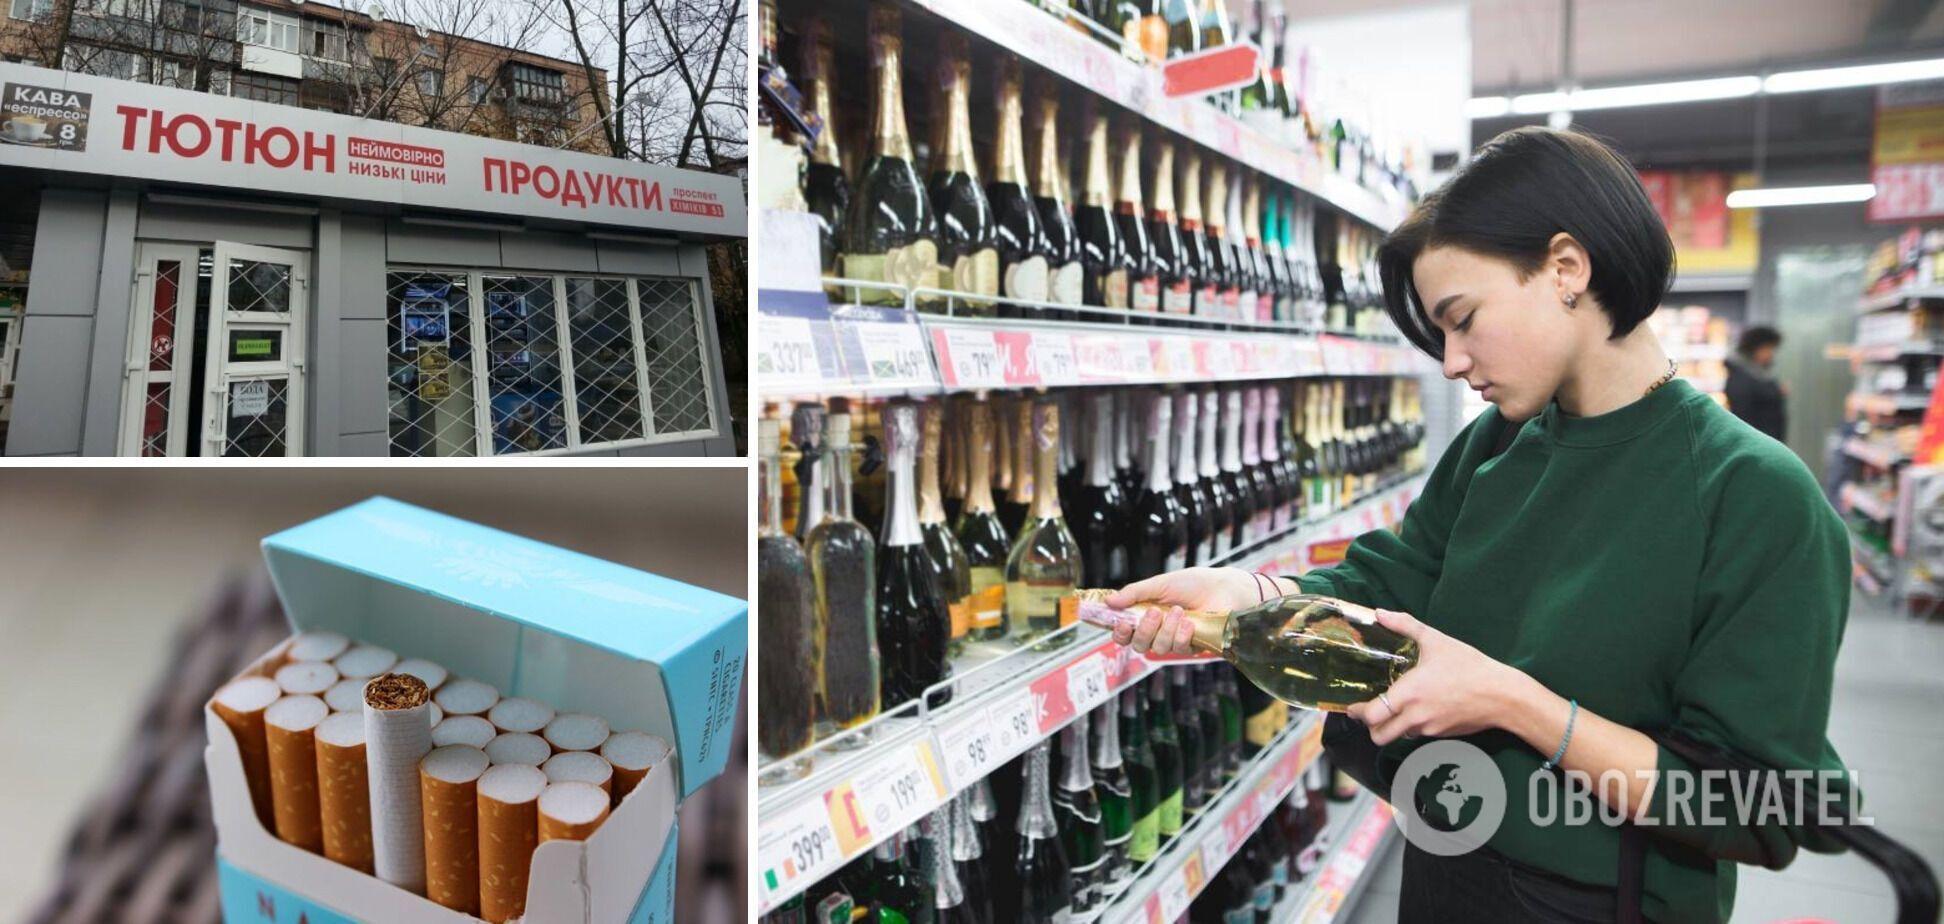 Сигарети та алкоголь не продаватимуть у супермаркетах.